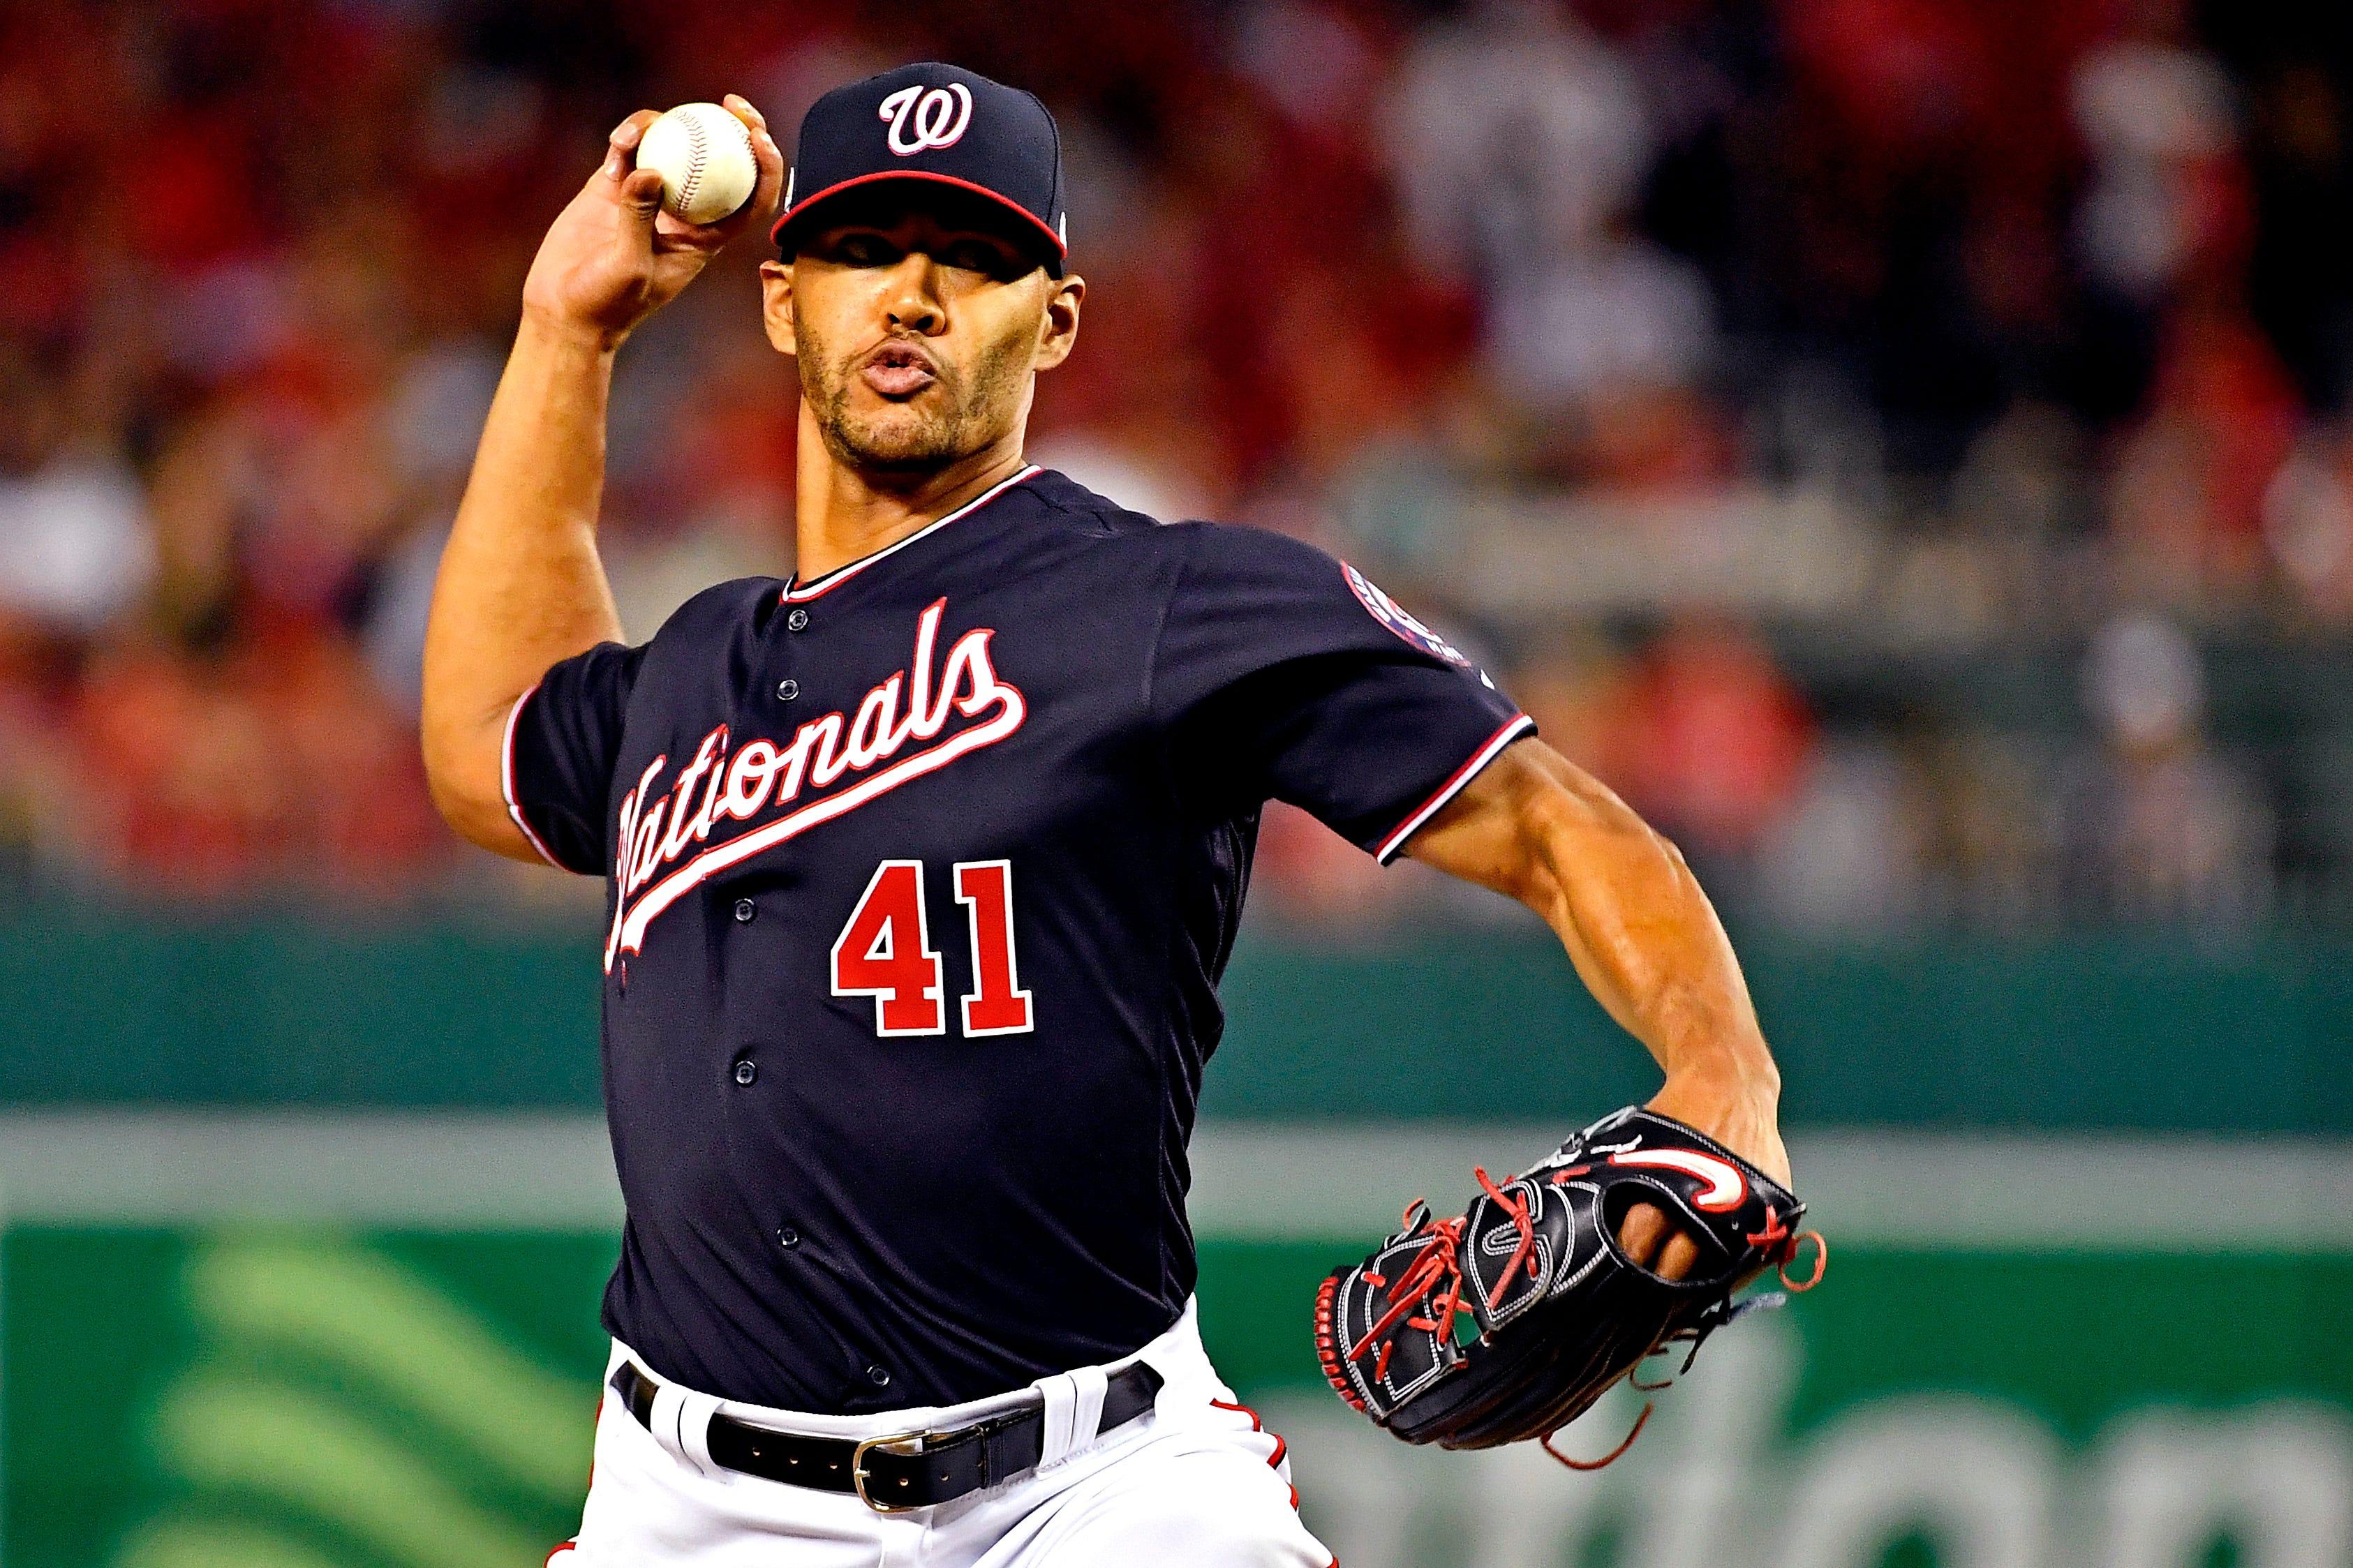 Joe Ross: Washington Nationals pitcher starts in place of Max Scherzer